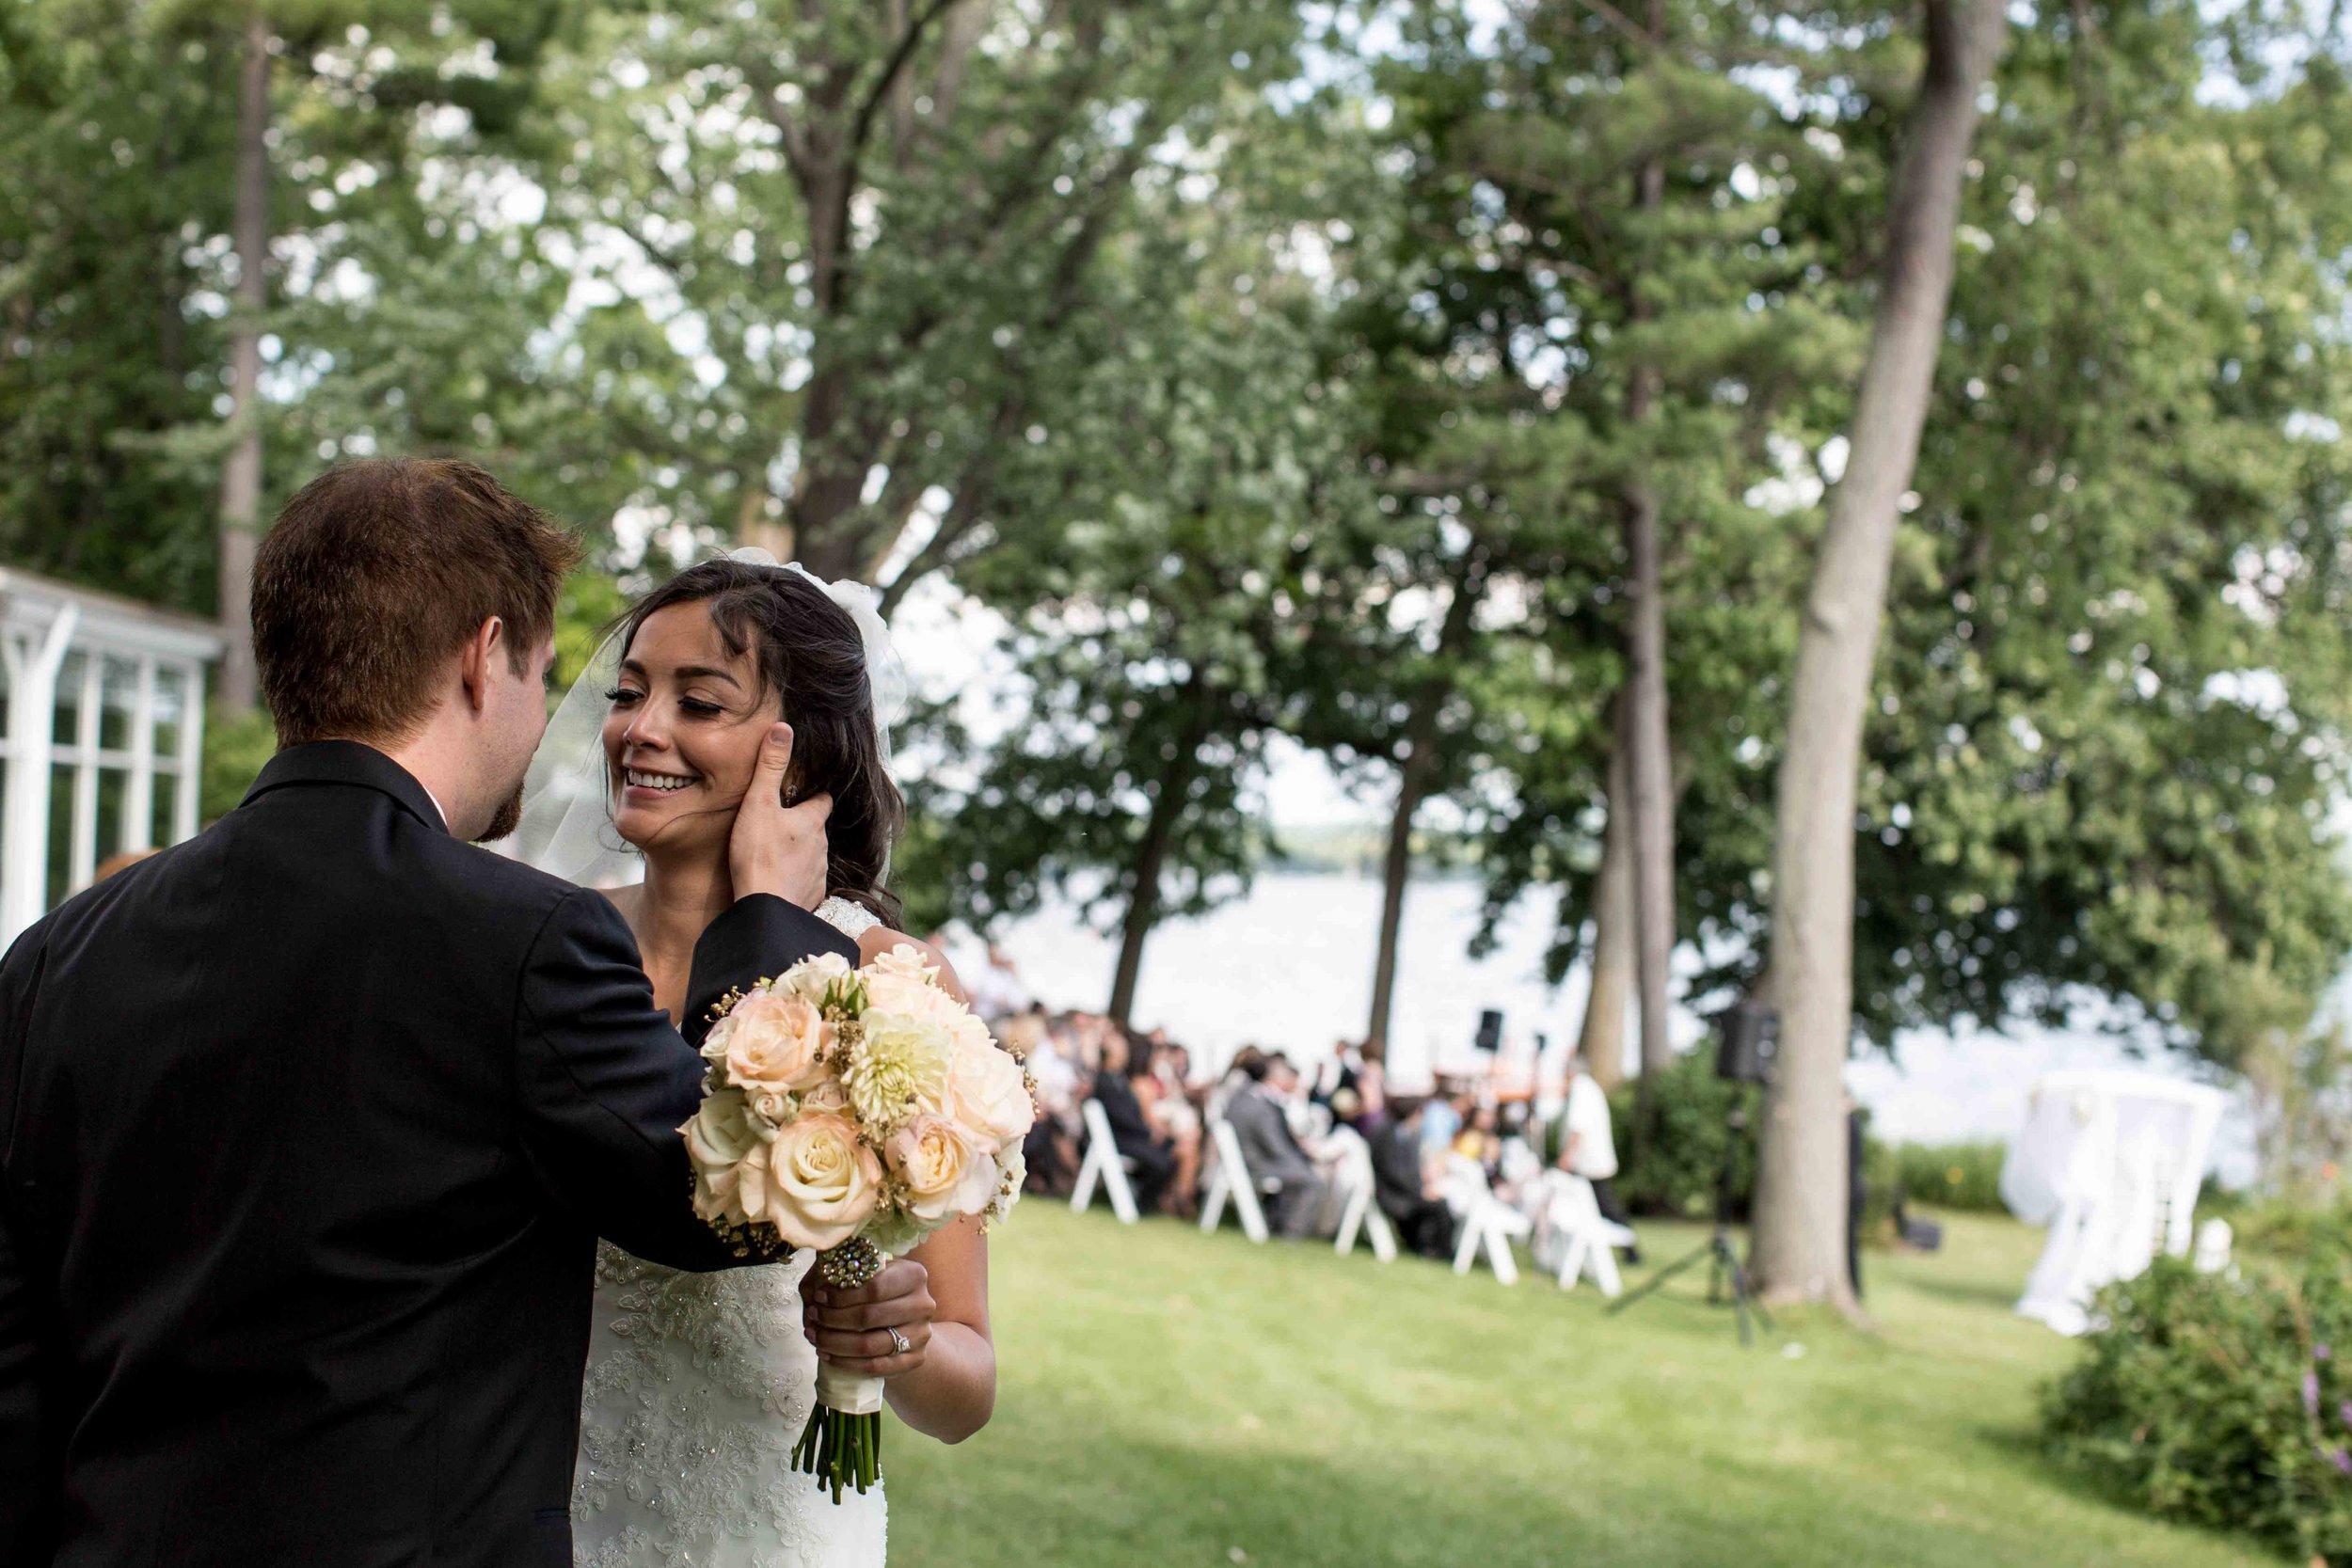 Destination Photographer wedding photos Best Wedding Photography Rose Photo -16.jpg